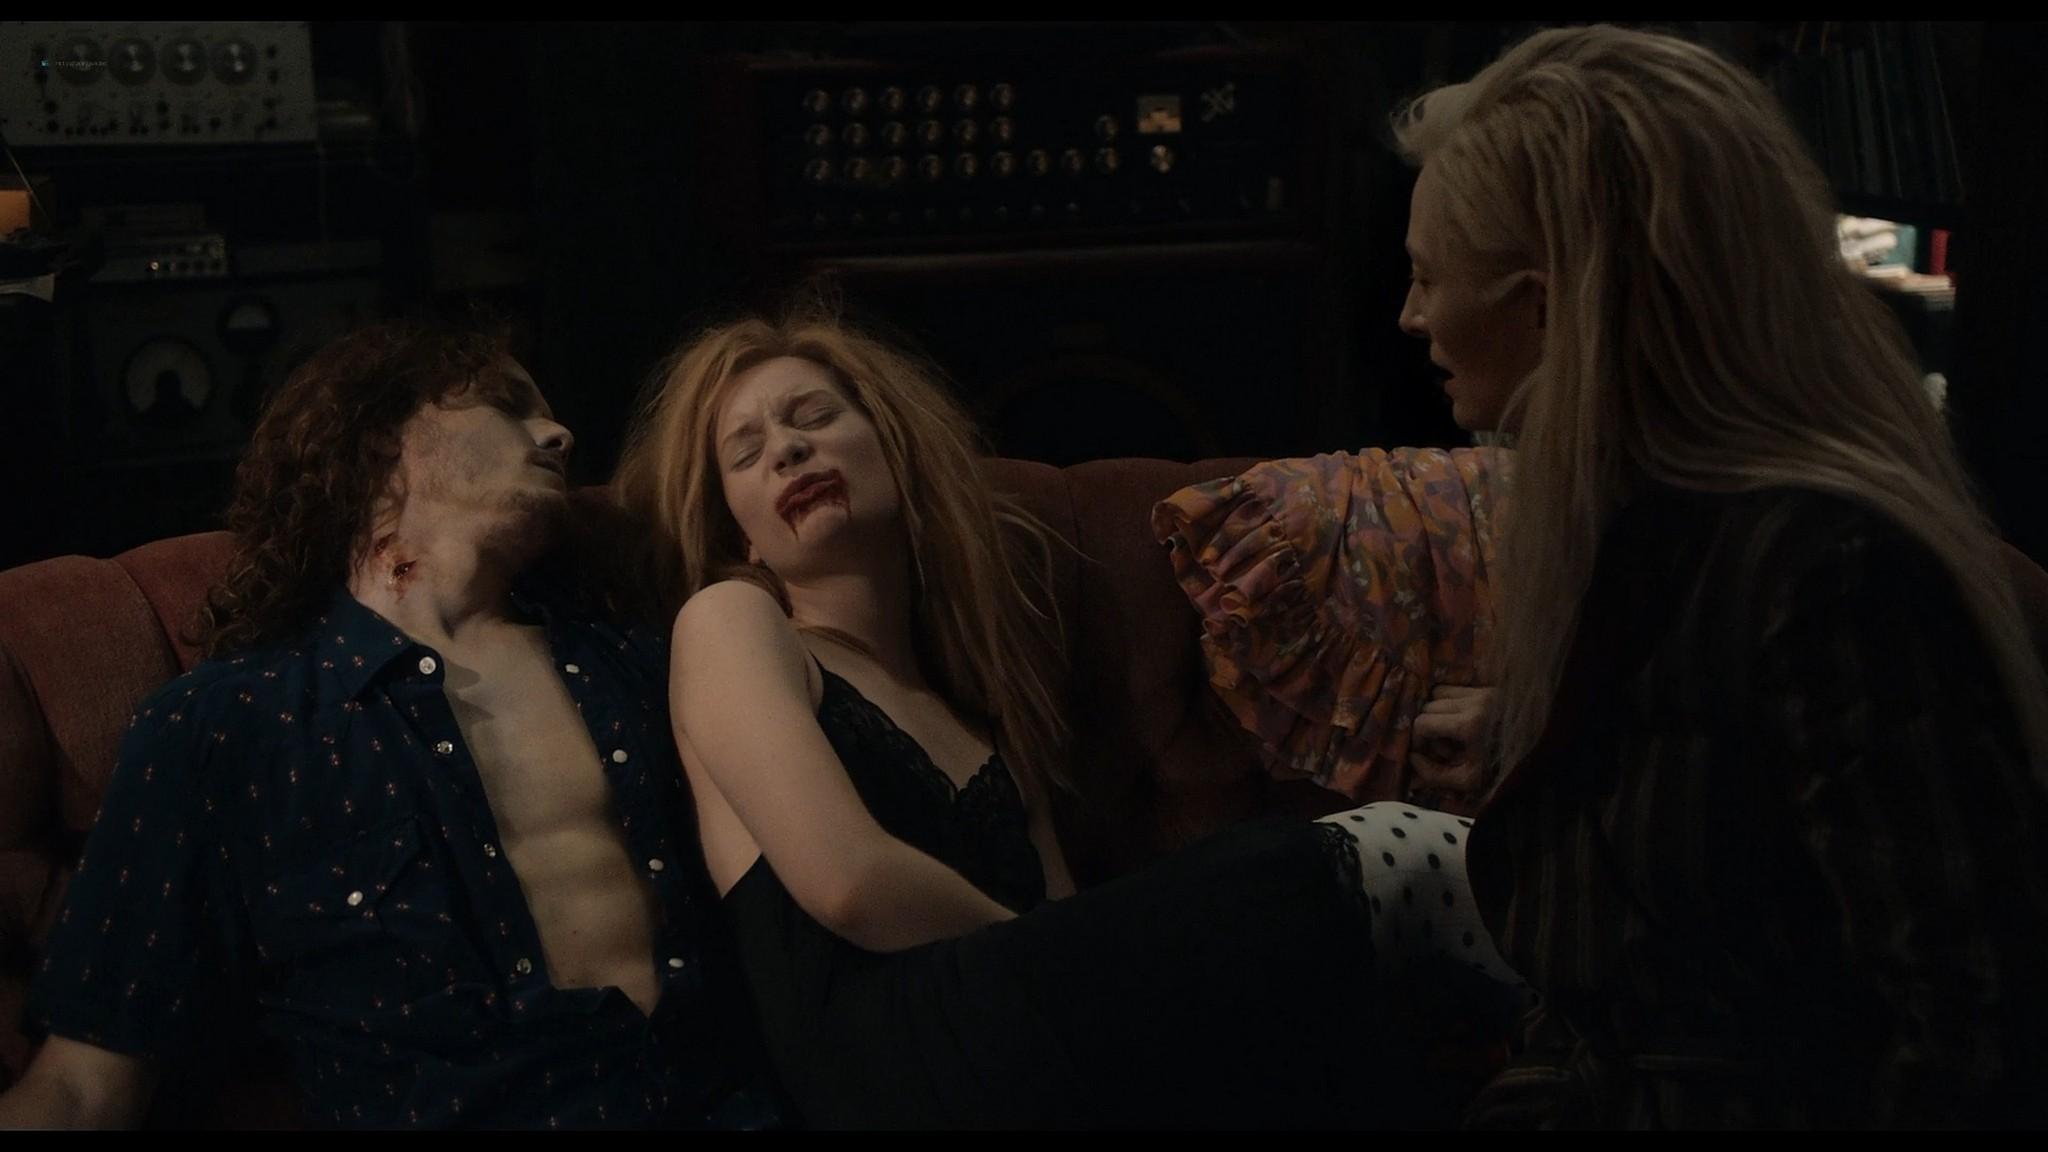 Tilda Swinton nude Mia Wasikowska sexy Only Lovers Left Alive 2013 HD 1080p BluRay 13